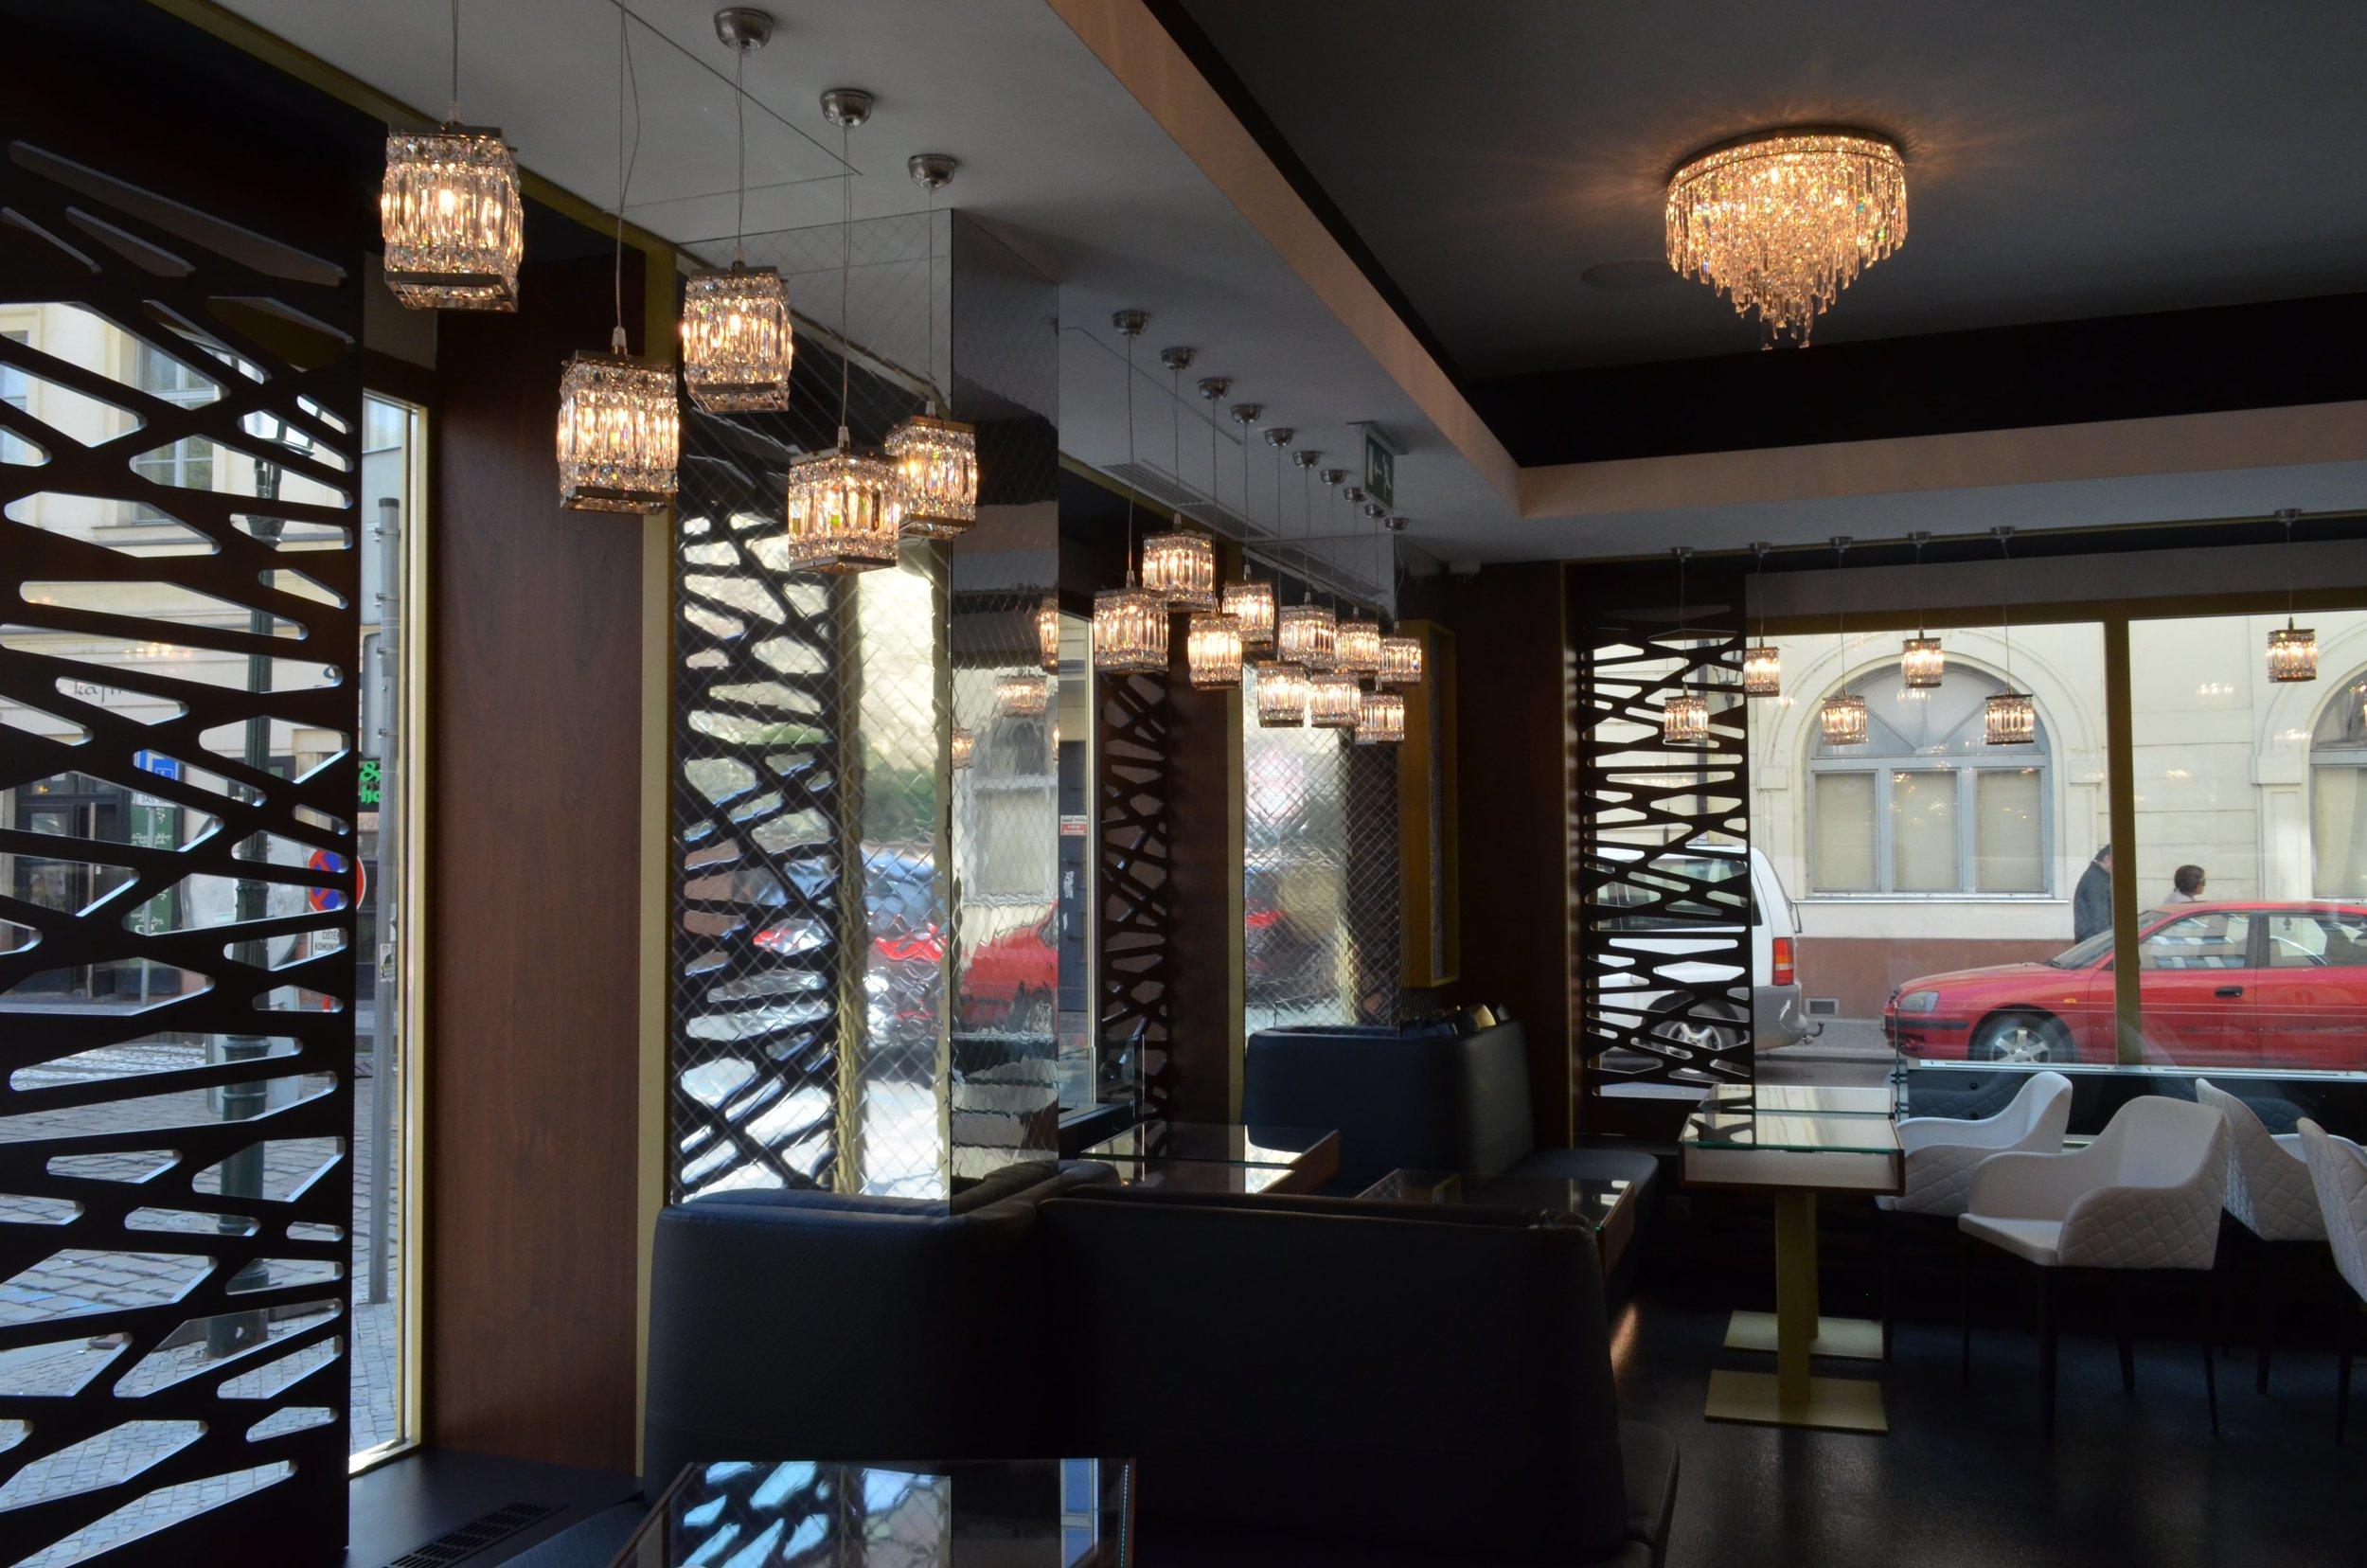 hotel-mysterius-wranovsky-crystal-chandeliers-2.JPG